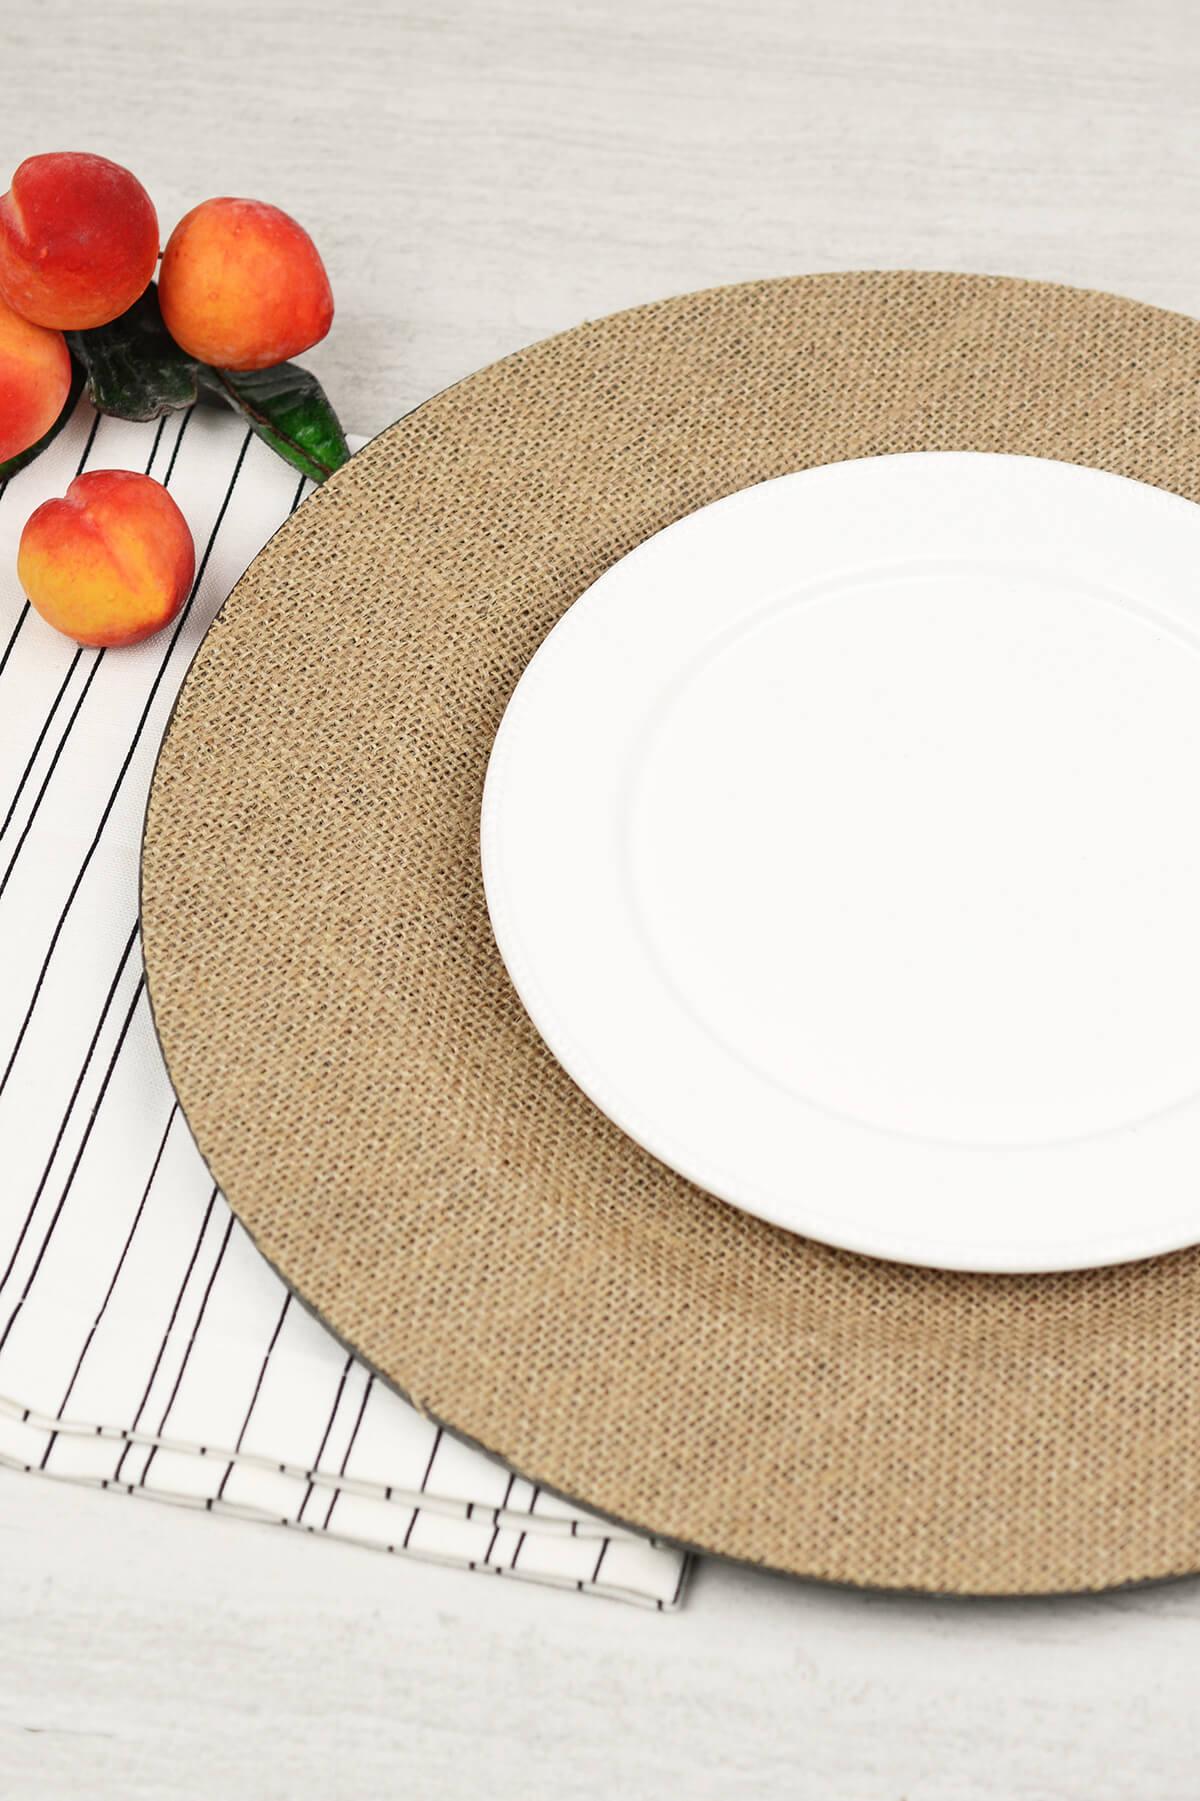 Burlap Charger Plates & Chargers \u0026 Serveware